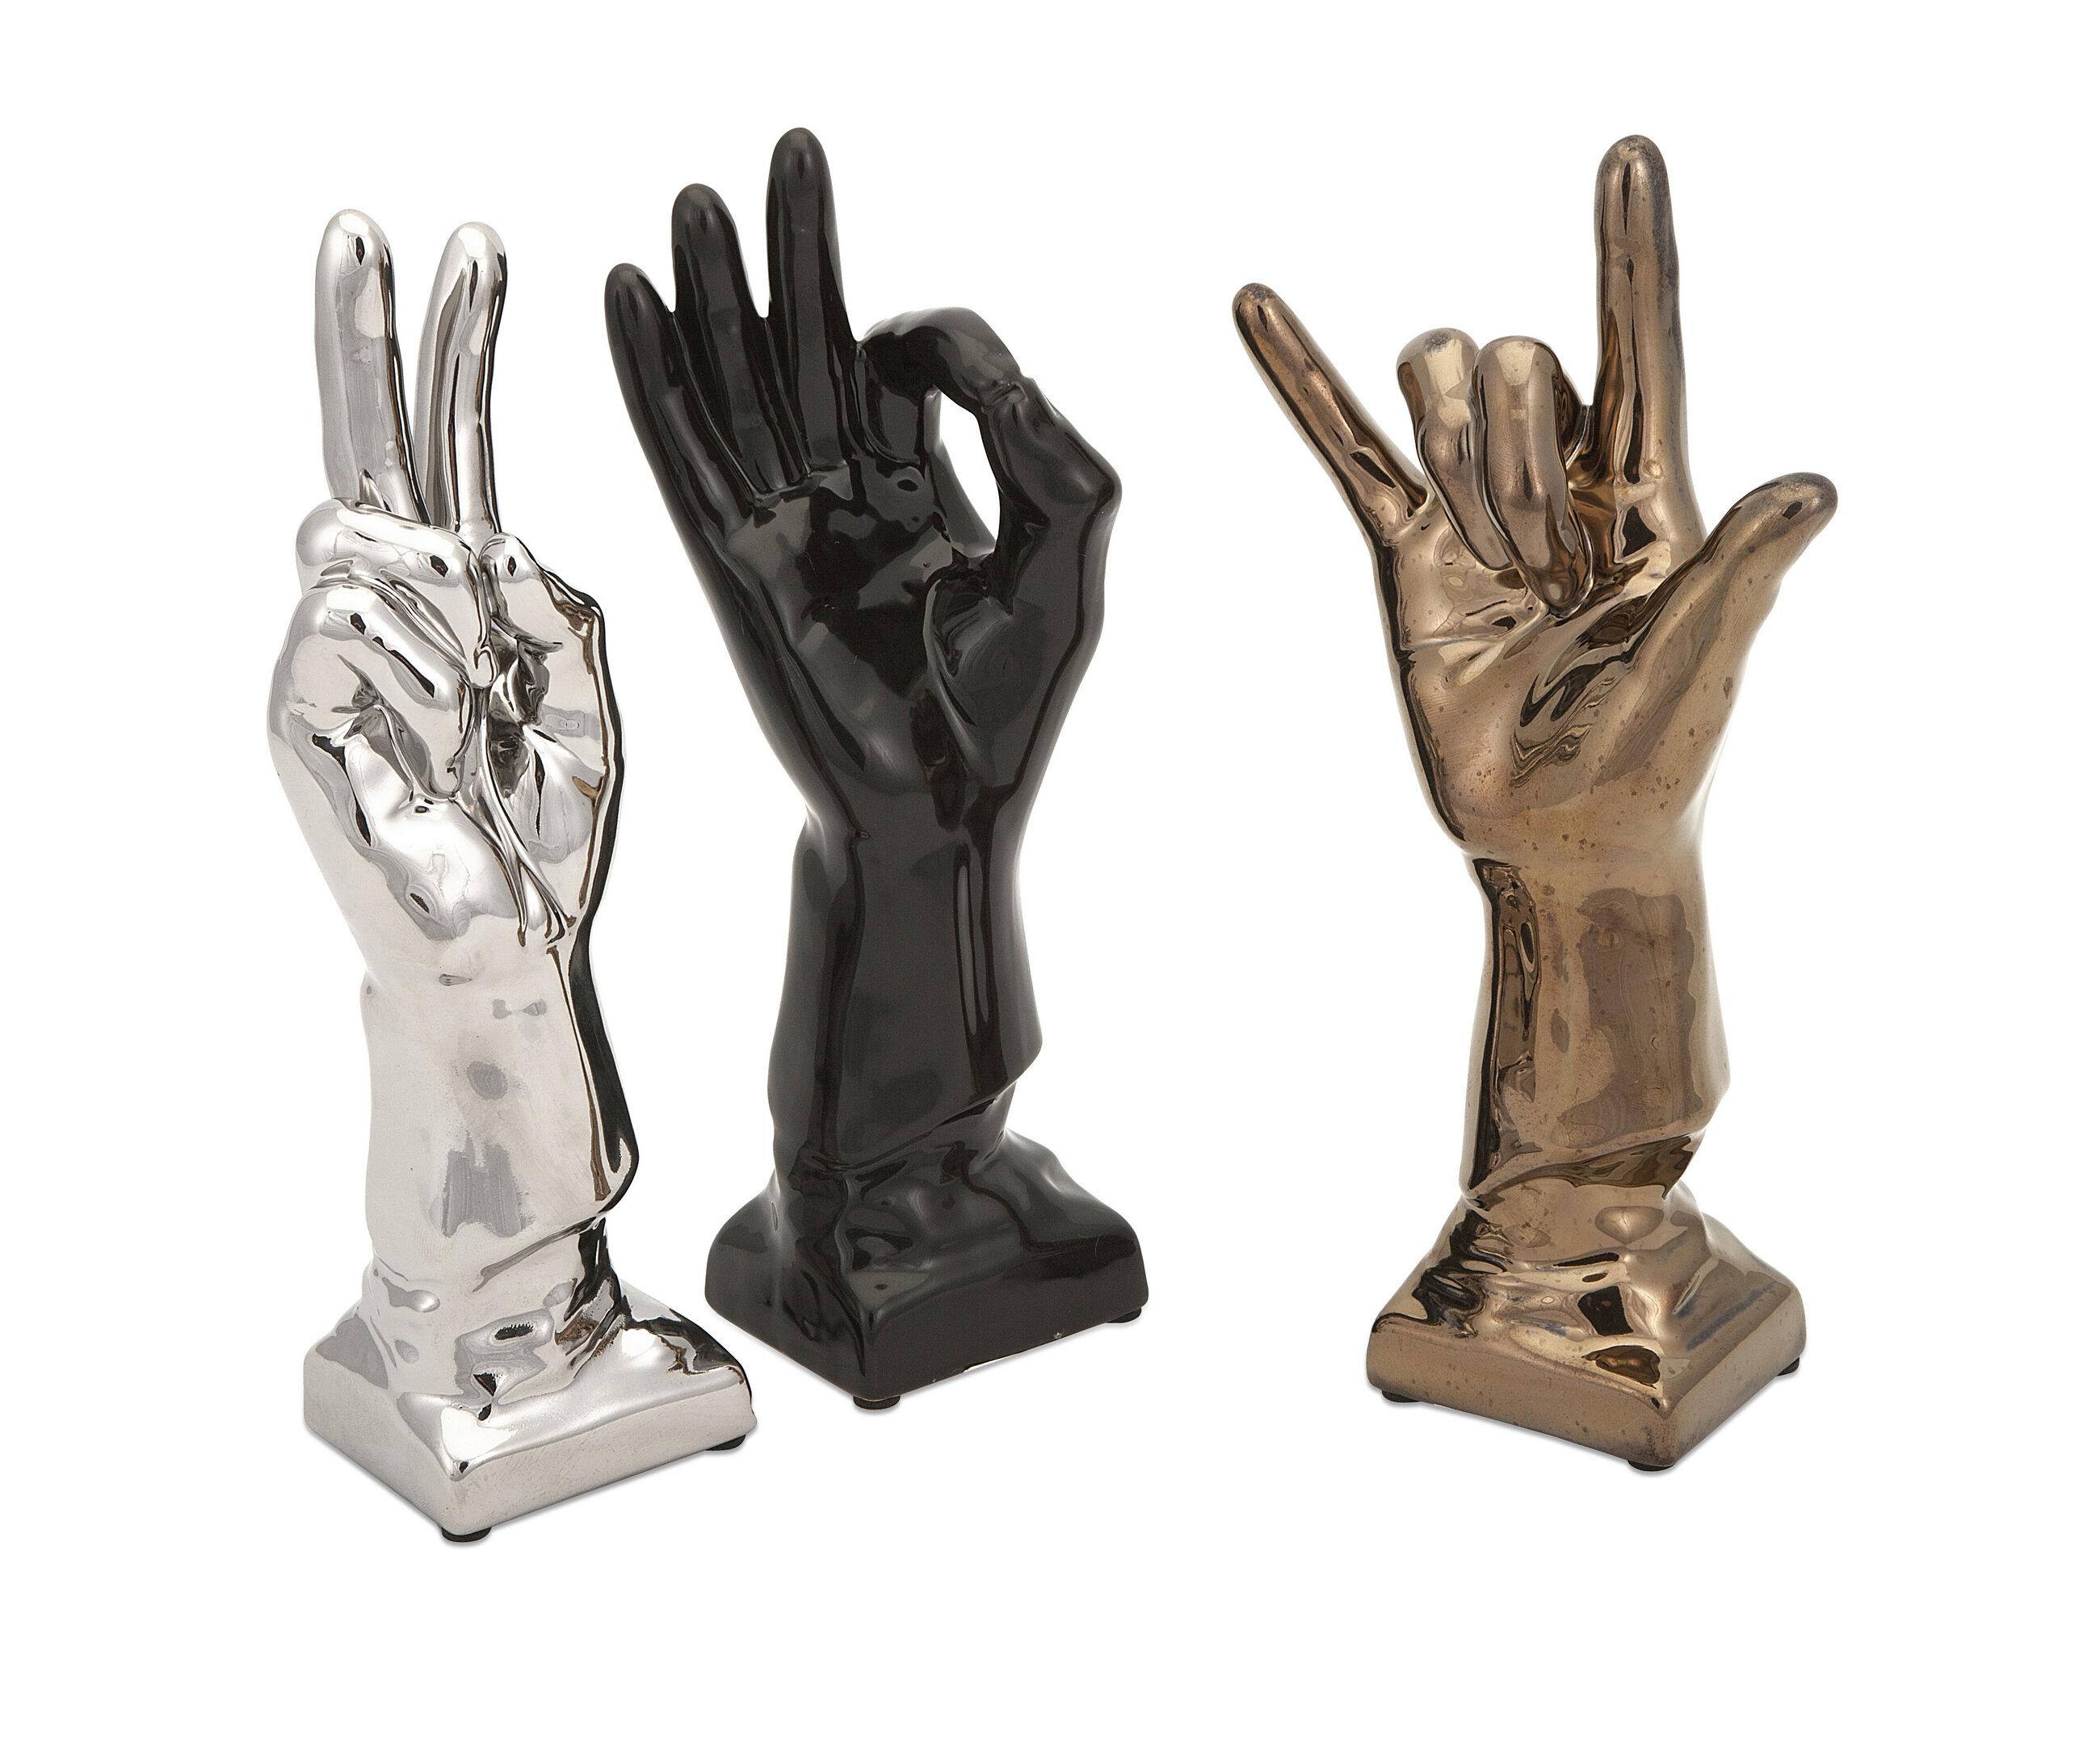 Ivy bronx clayborn unique ceramic hands 3 piece sculpture set wayfair